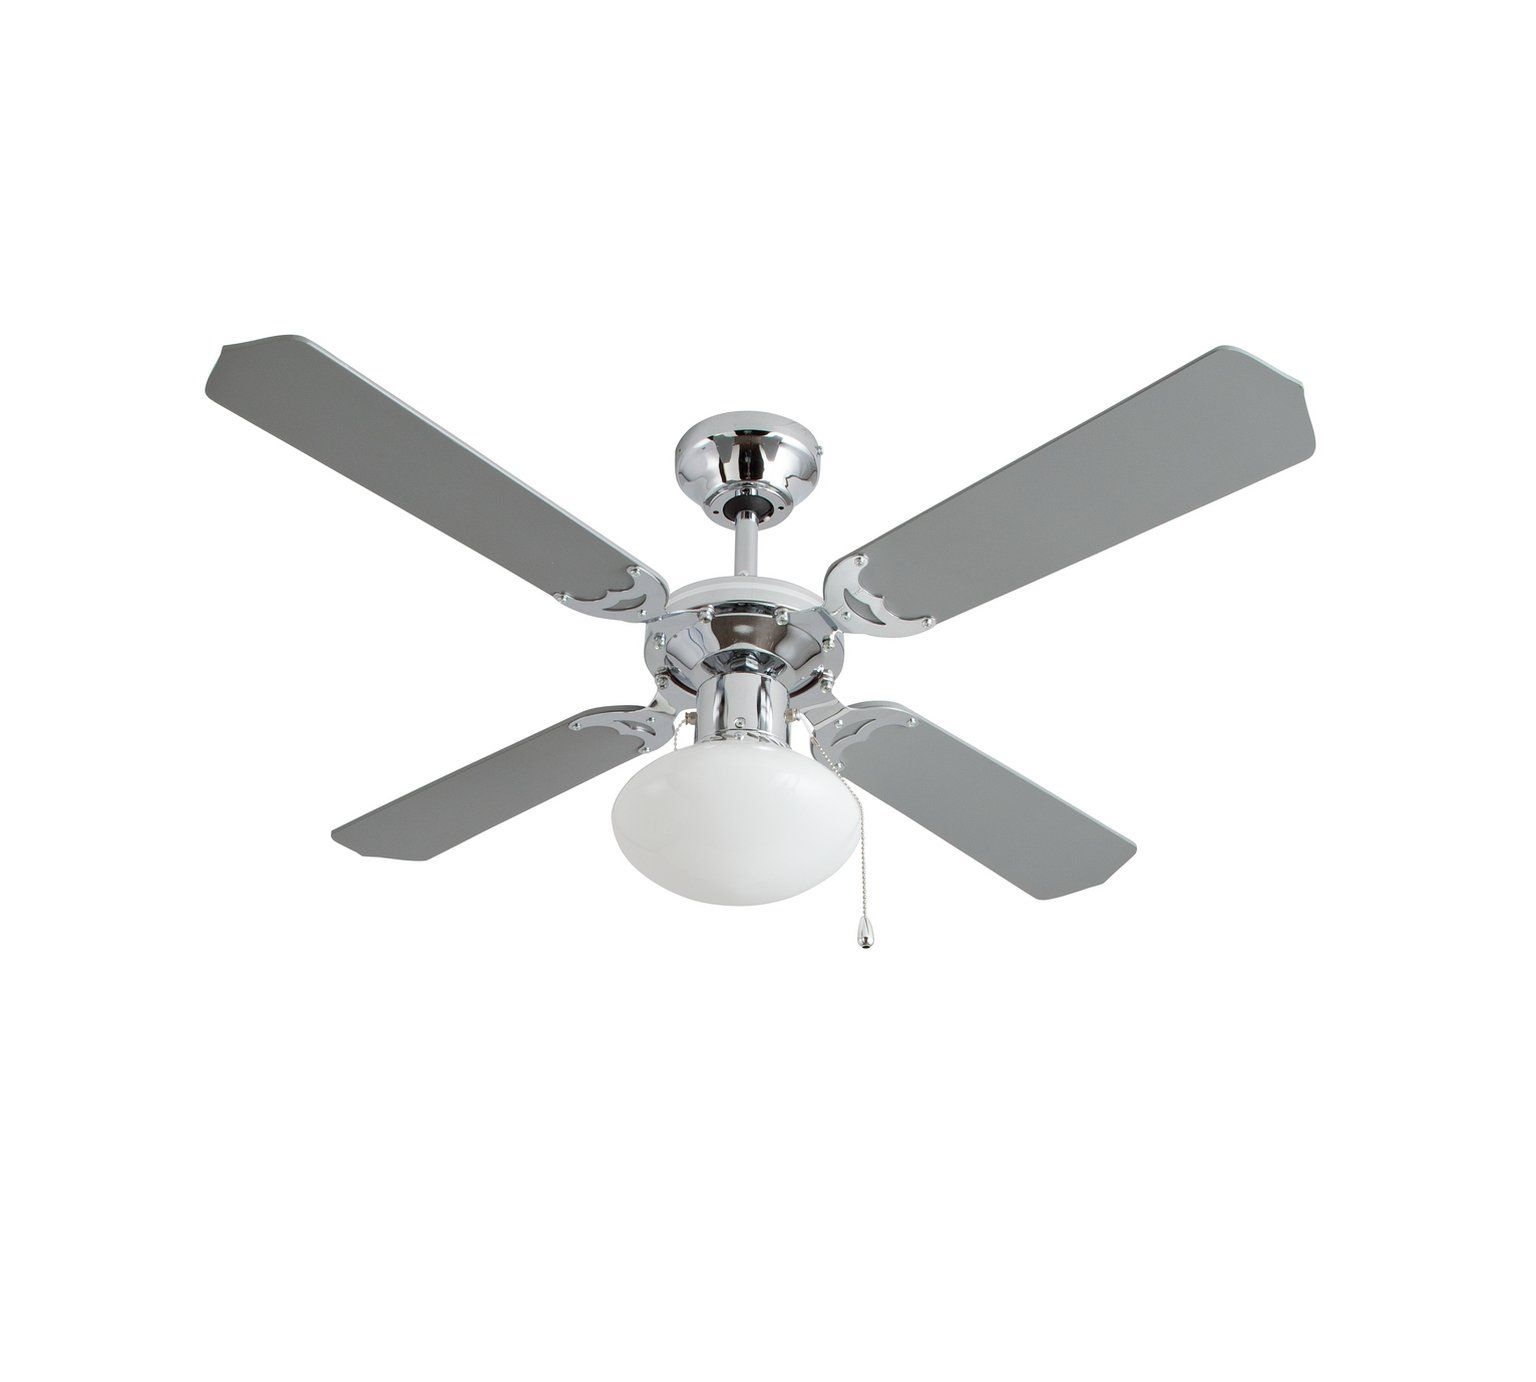 Buy Argos Home Ceiling Fan - Grey & Chrome   Ceiling fans ...